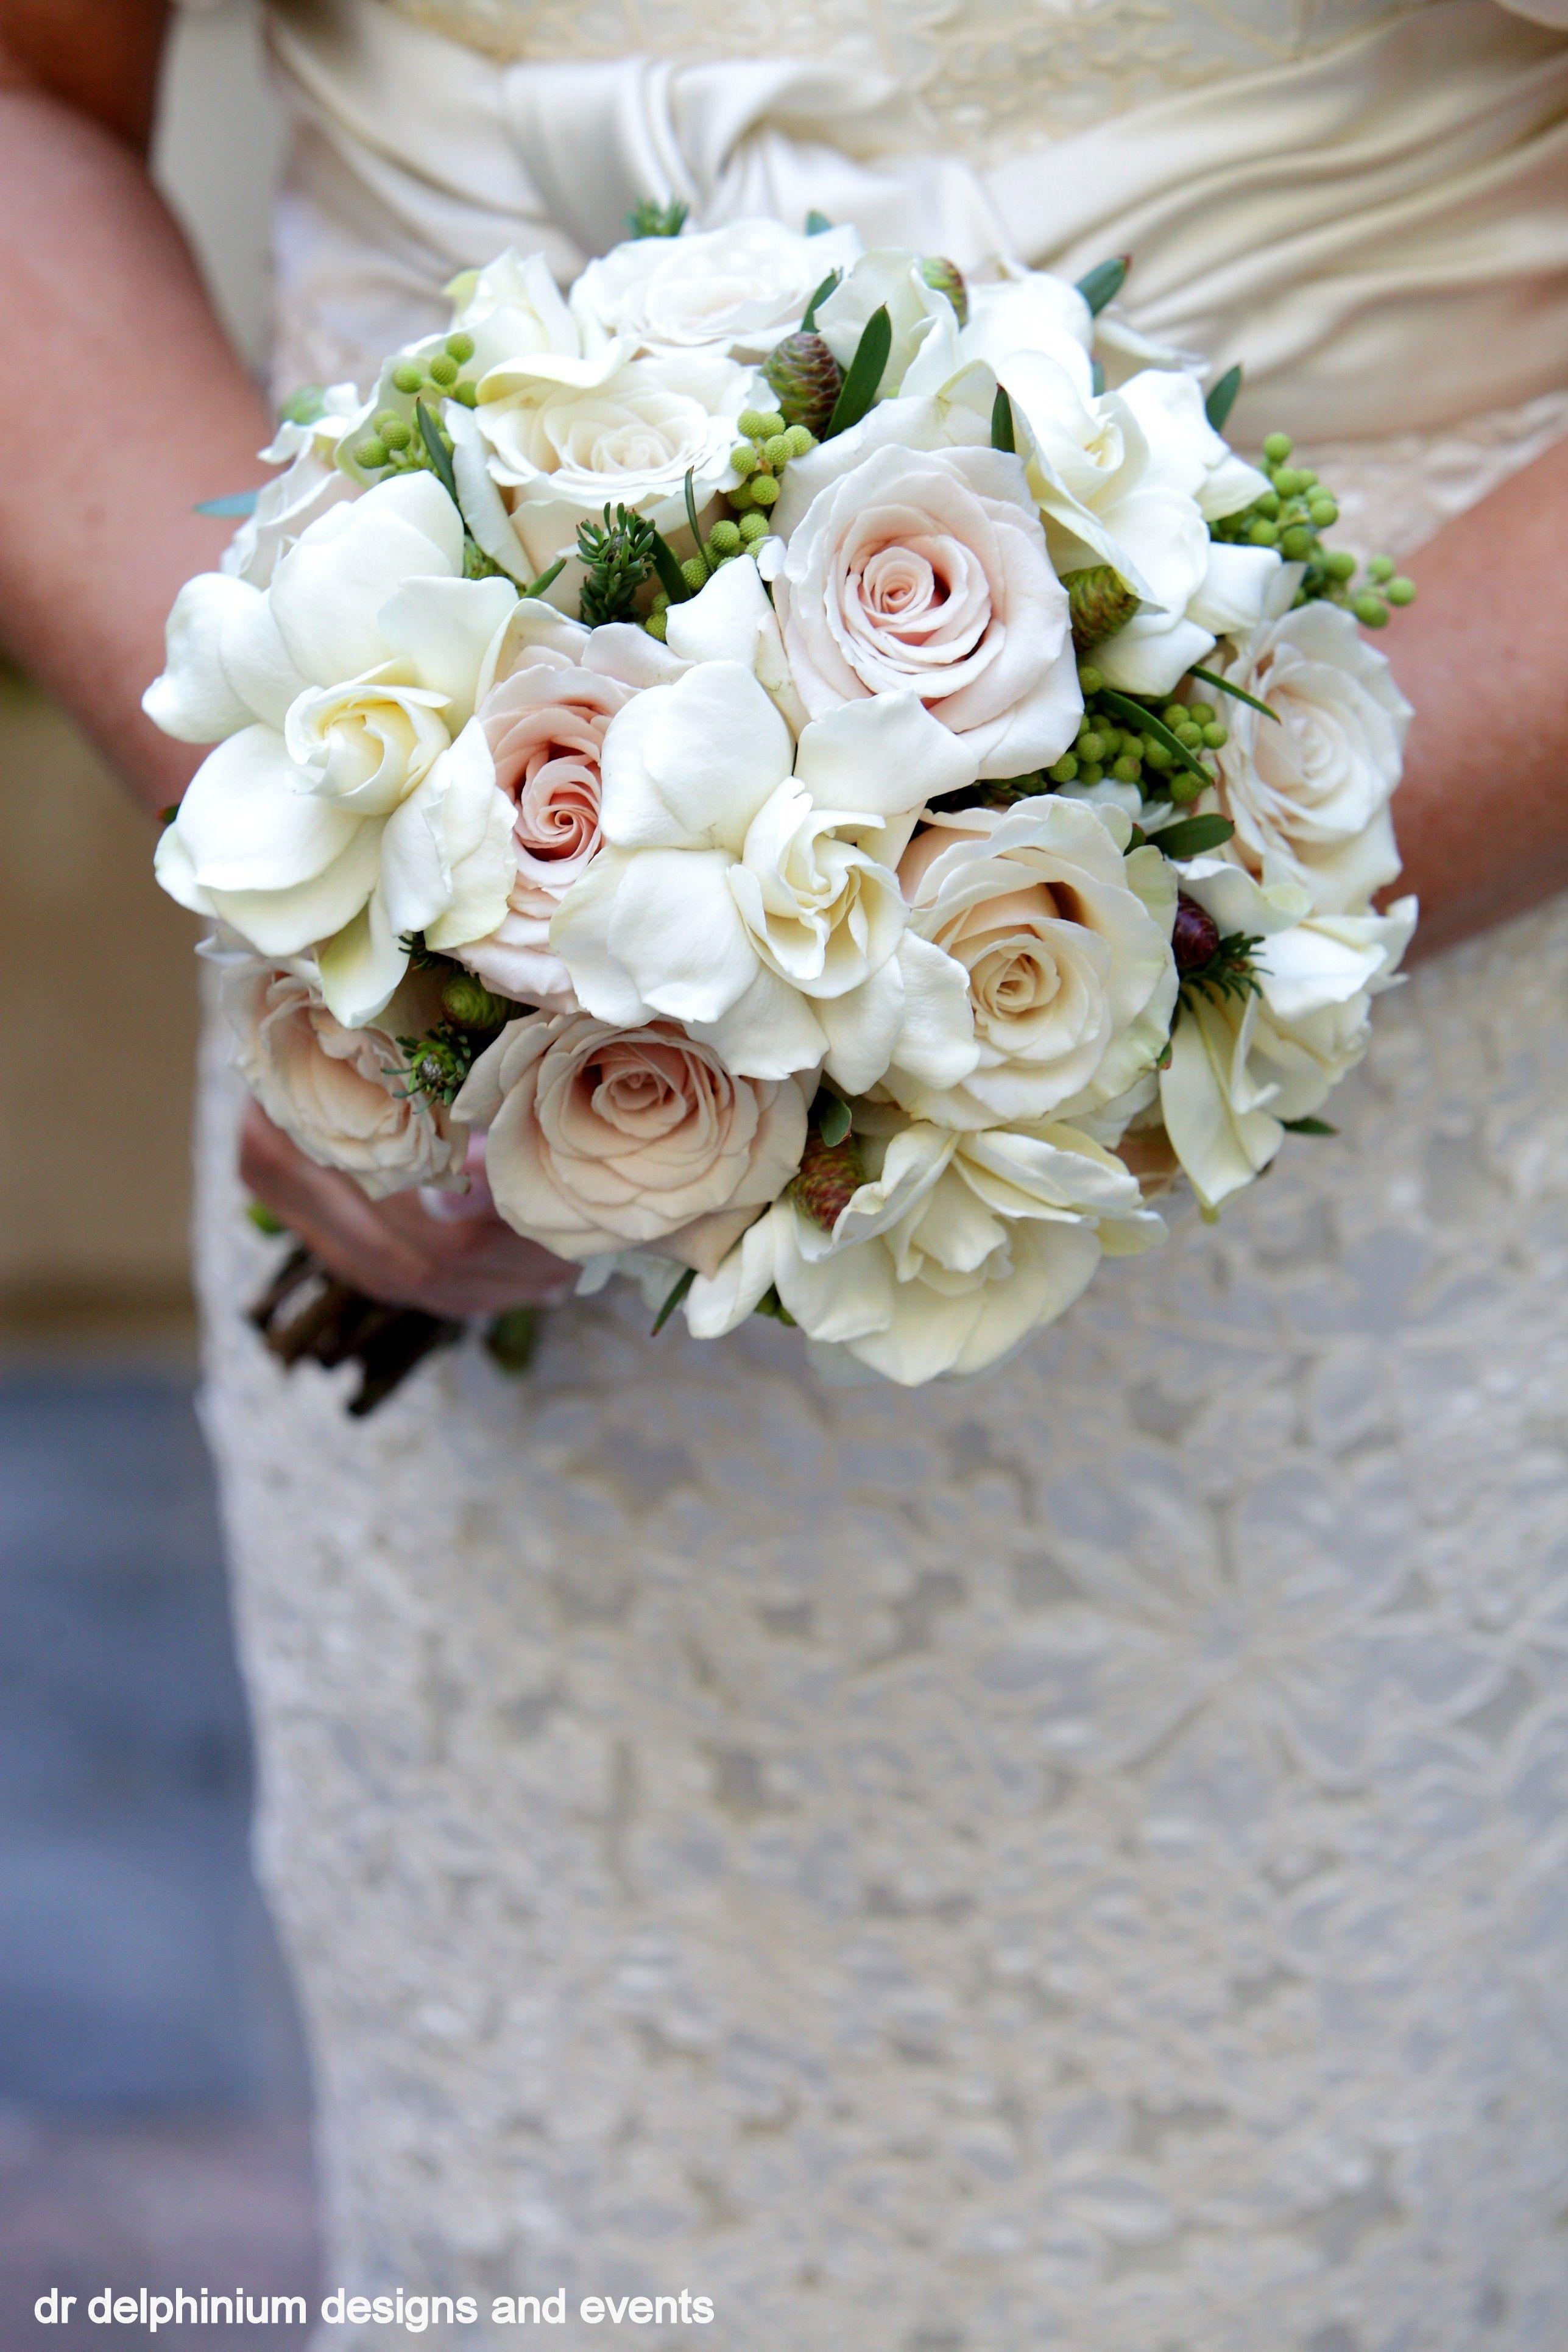 Dr Delphinium Bouquet Gardenia Roses Gardenia Bridal Bouquet